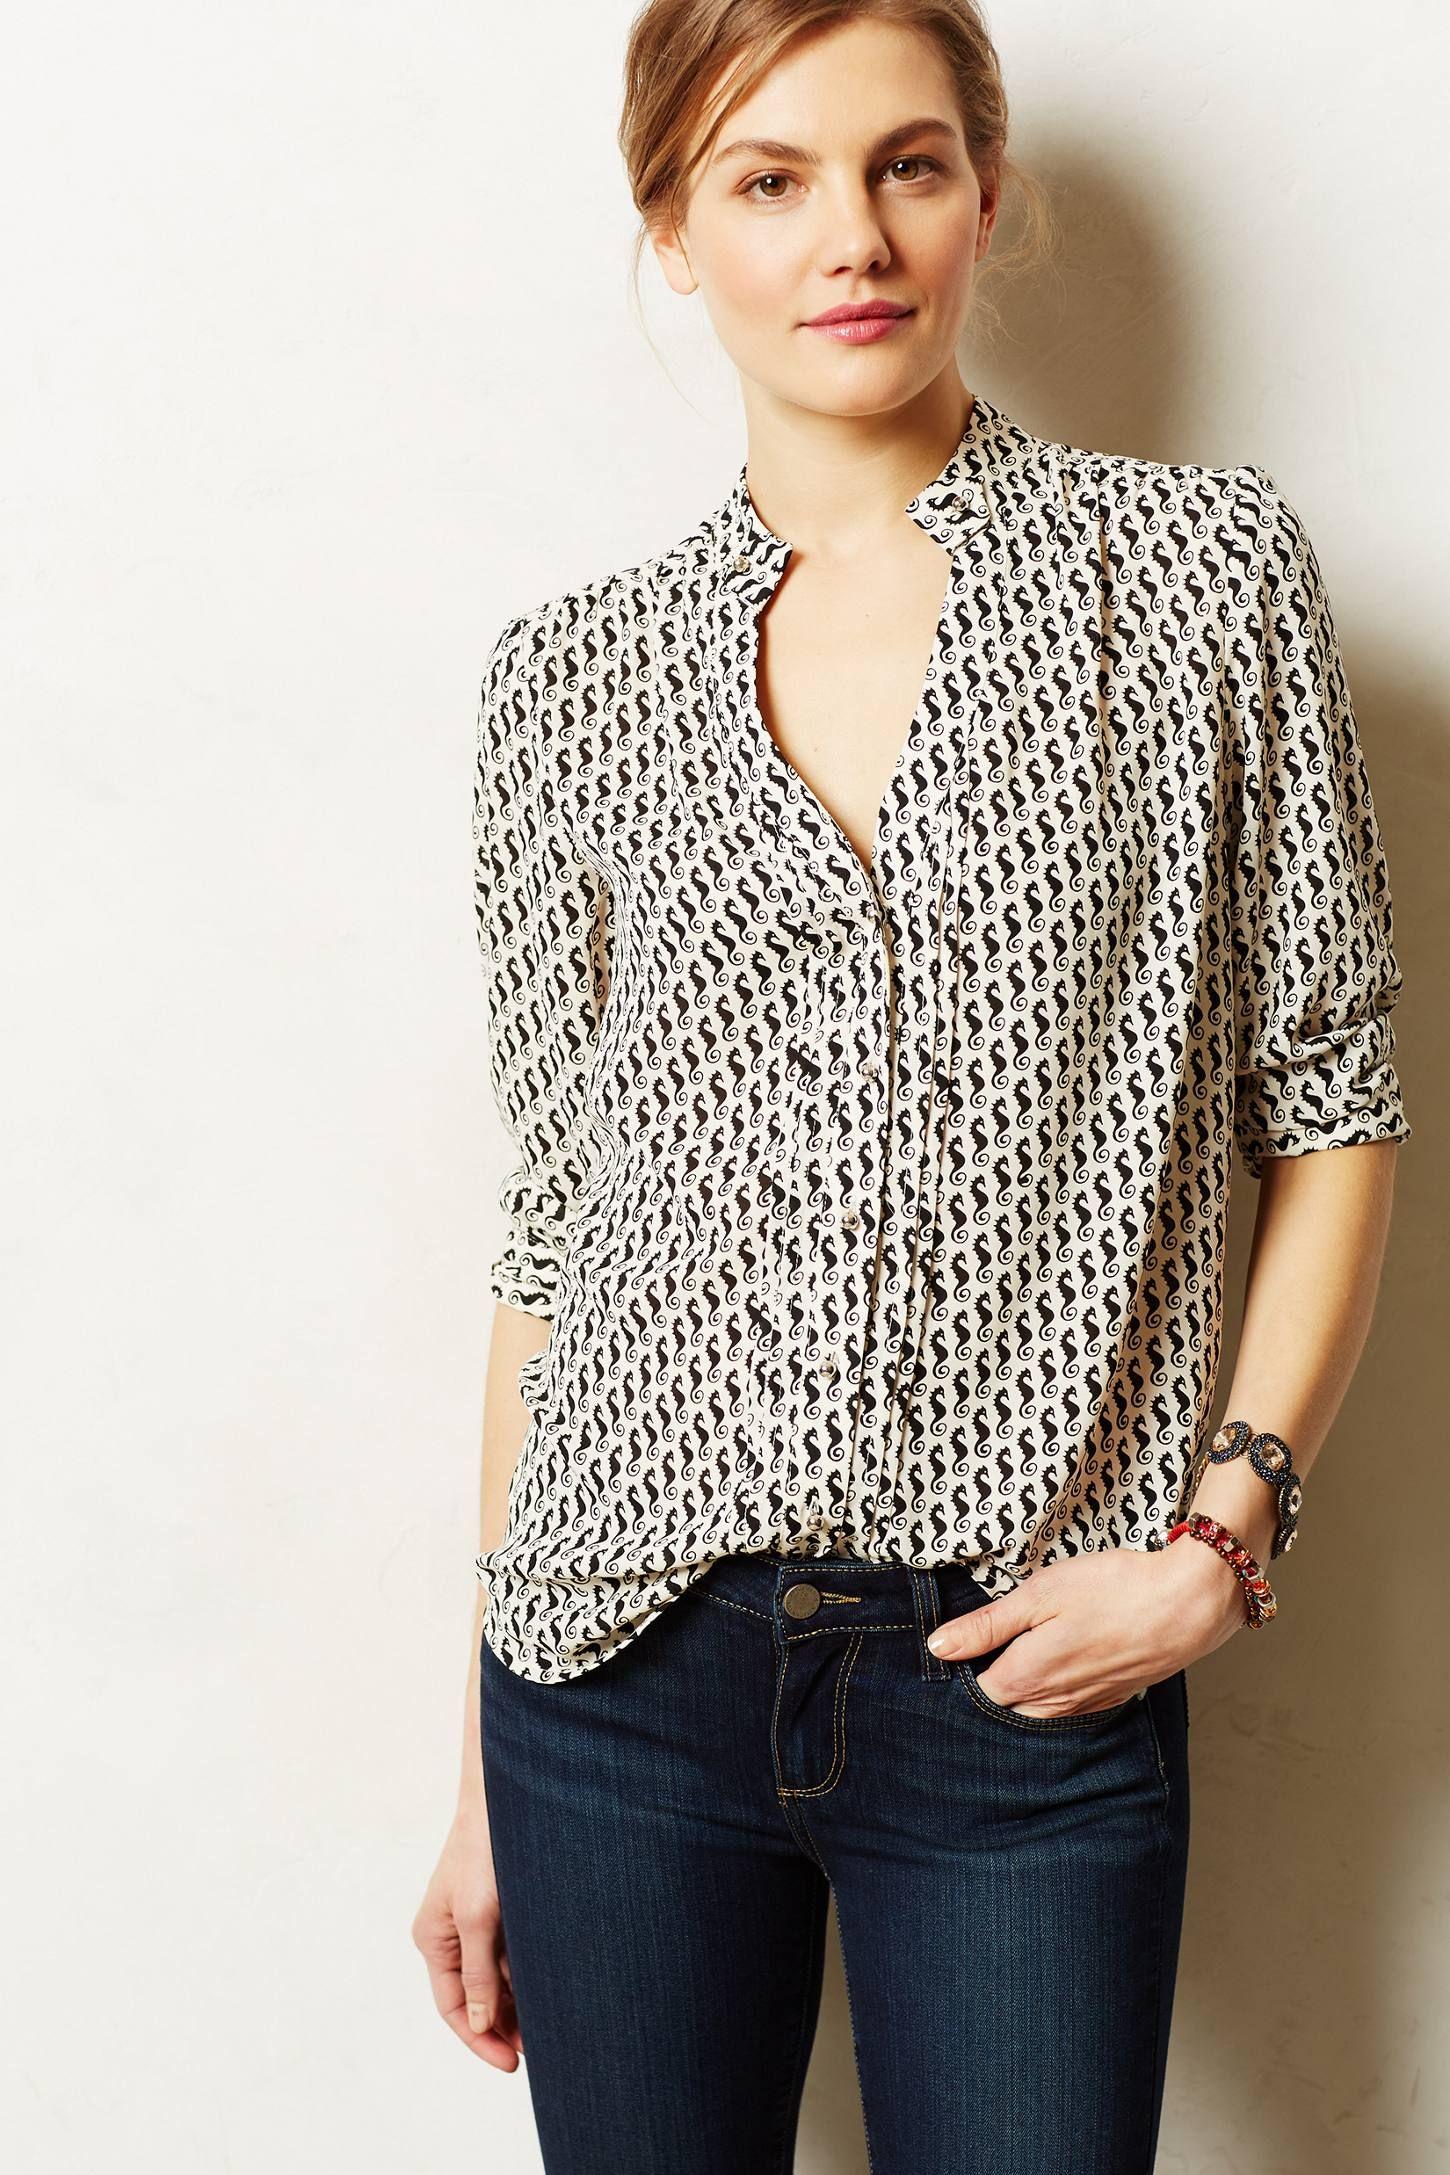 laceshine blouse anthropologiecom anthrofave